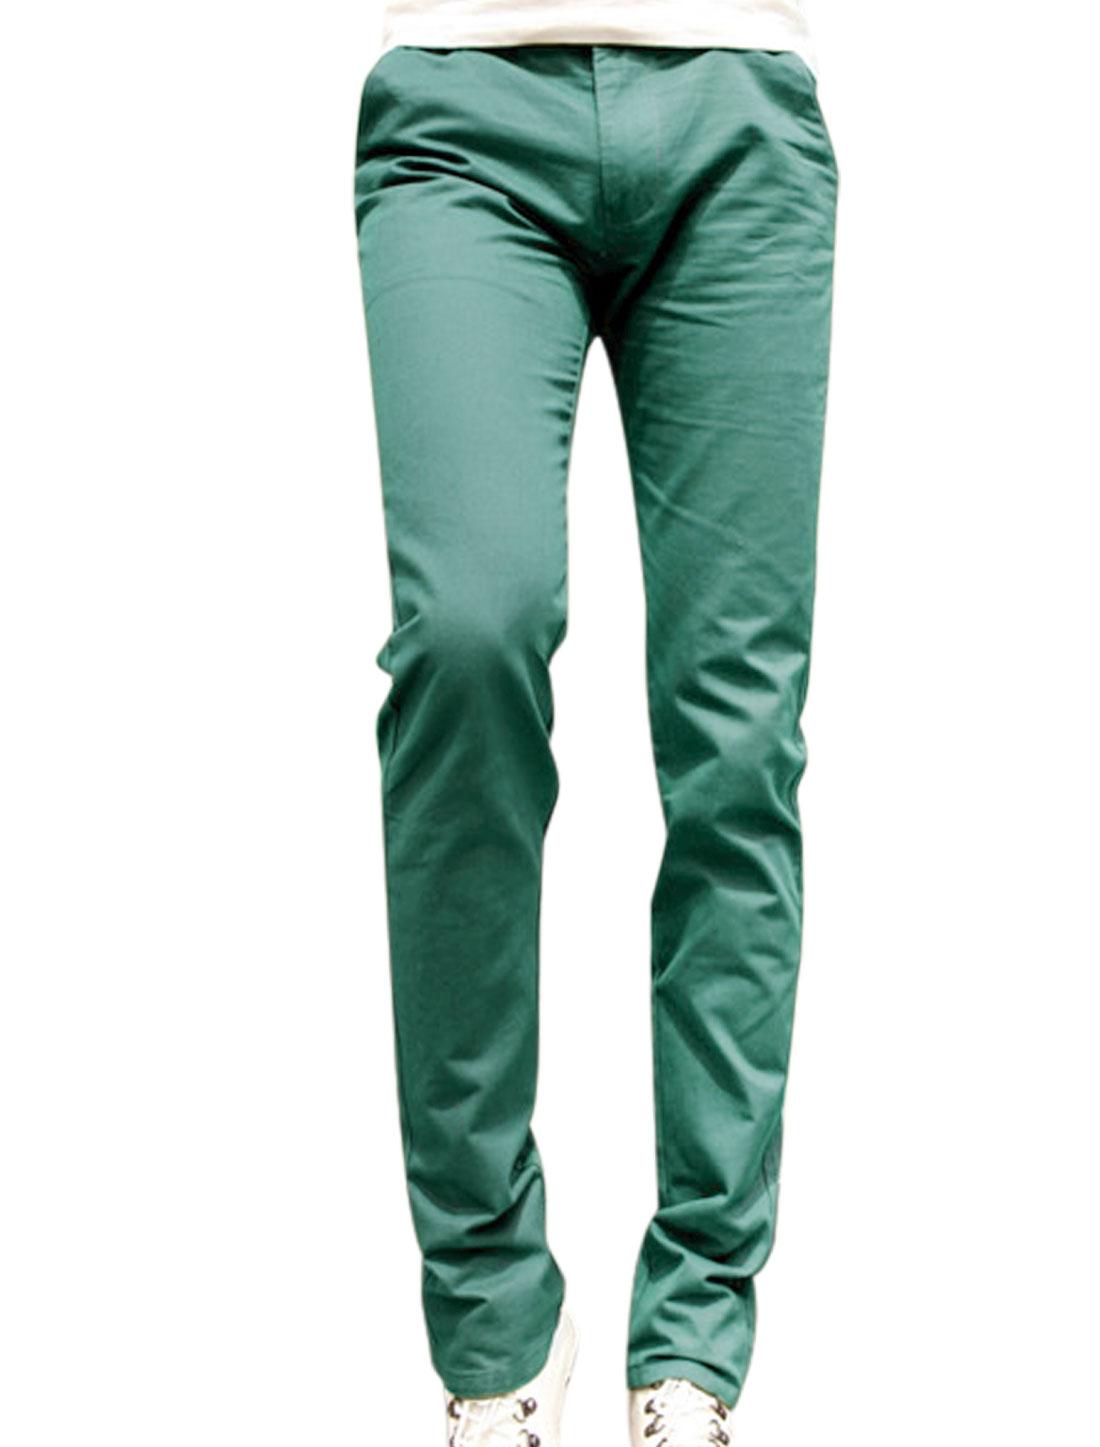 Man Button Closure Slim Fit Mid Rise Aqua Straight Leg Pants W30